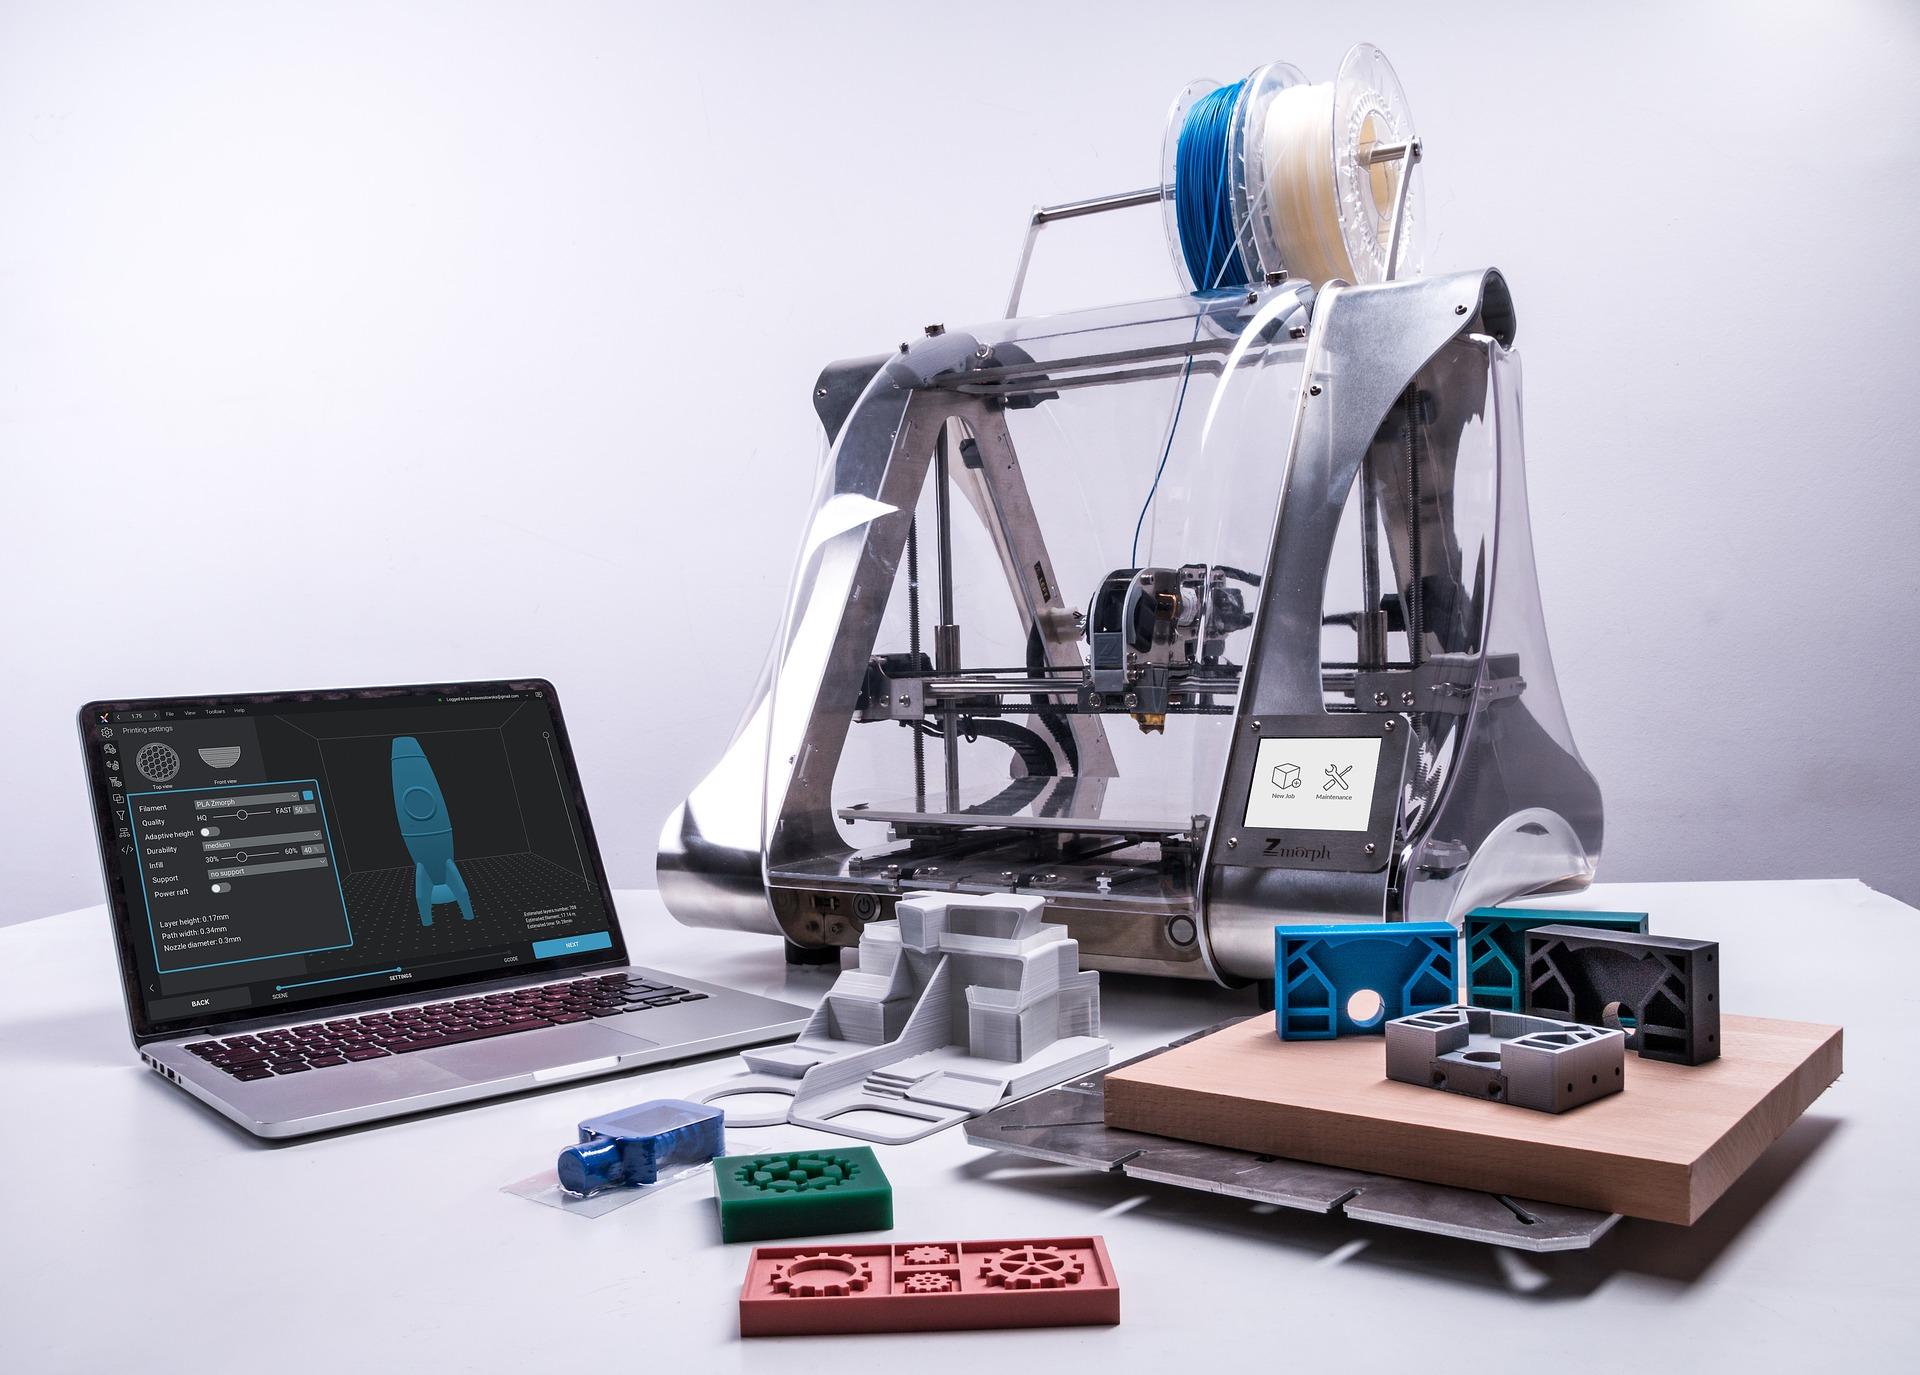 Cardboard Helicopter Product Design Cleveland Product Development Prototype website image9.jpg